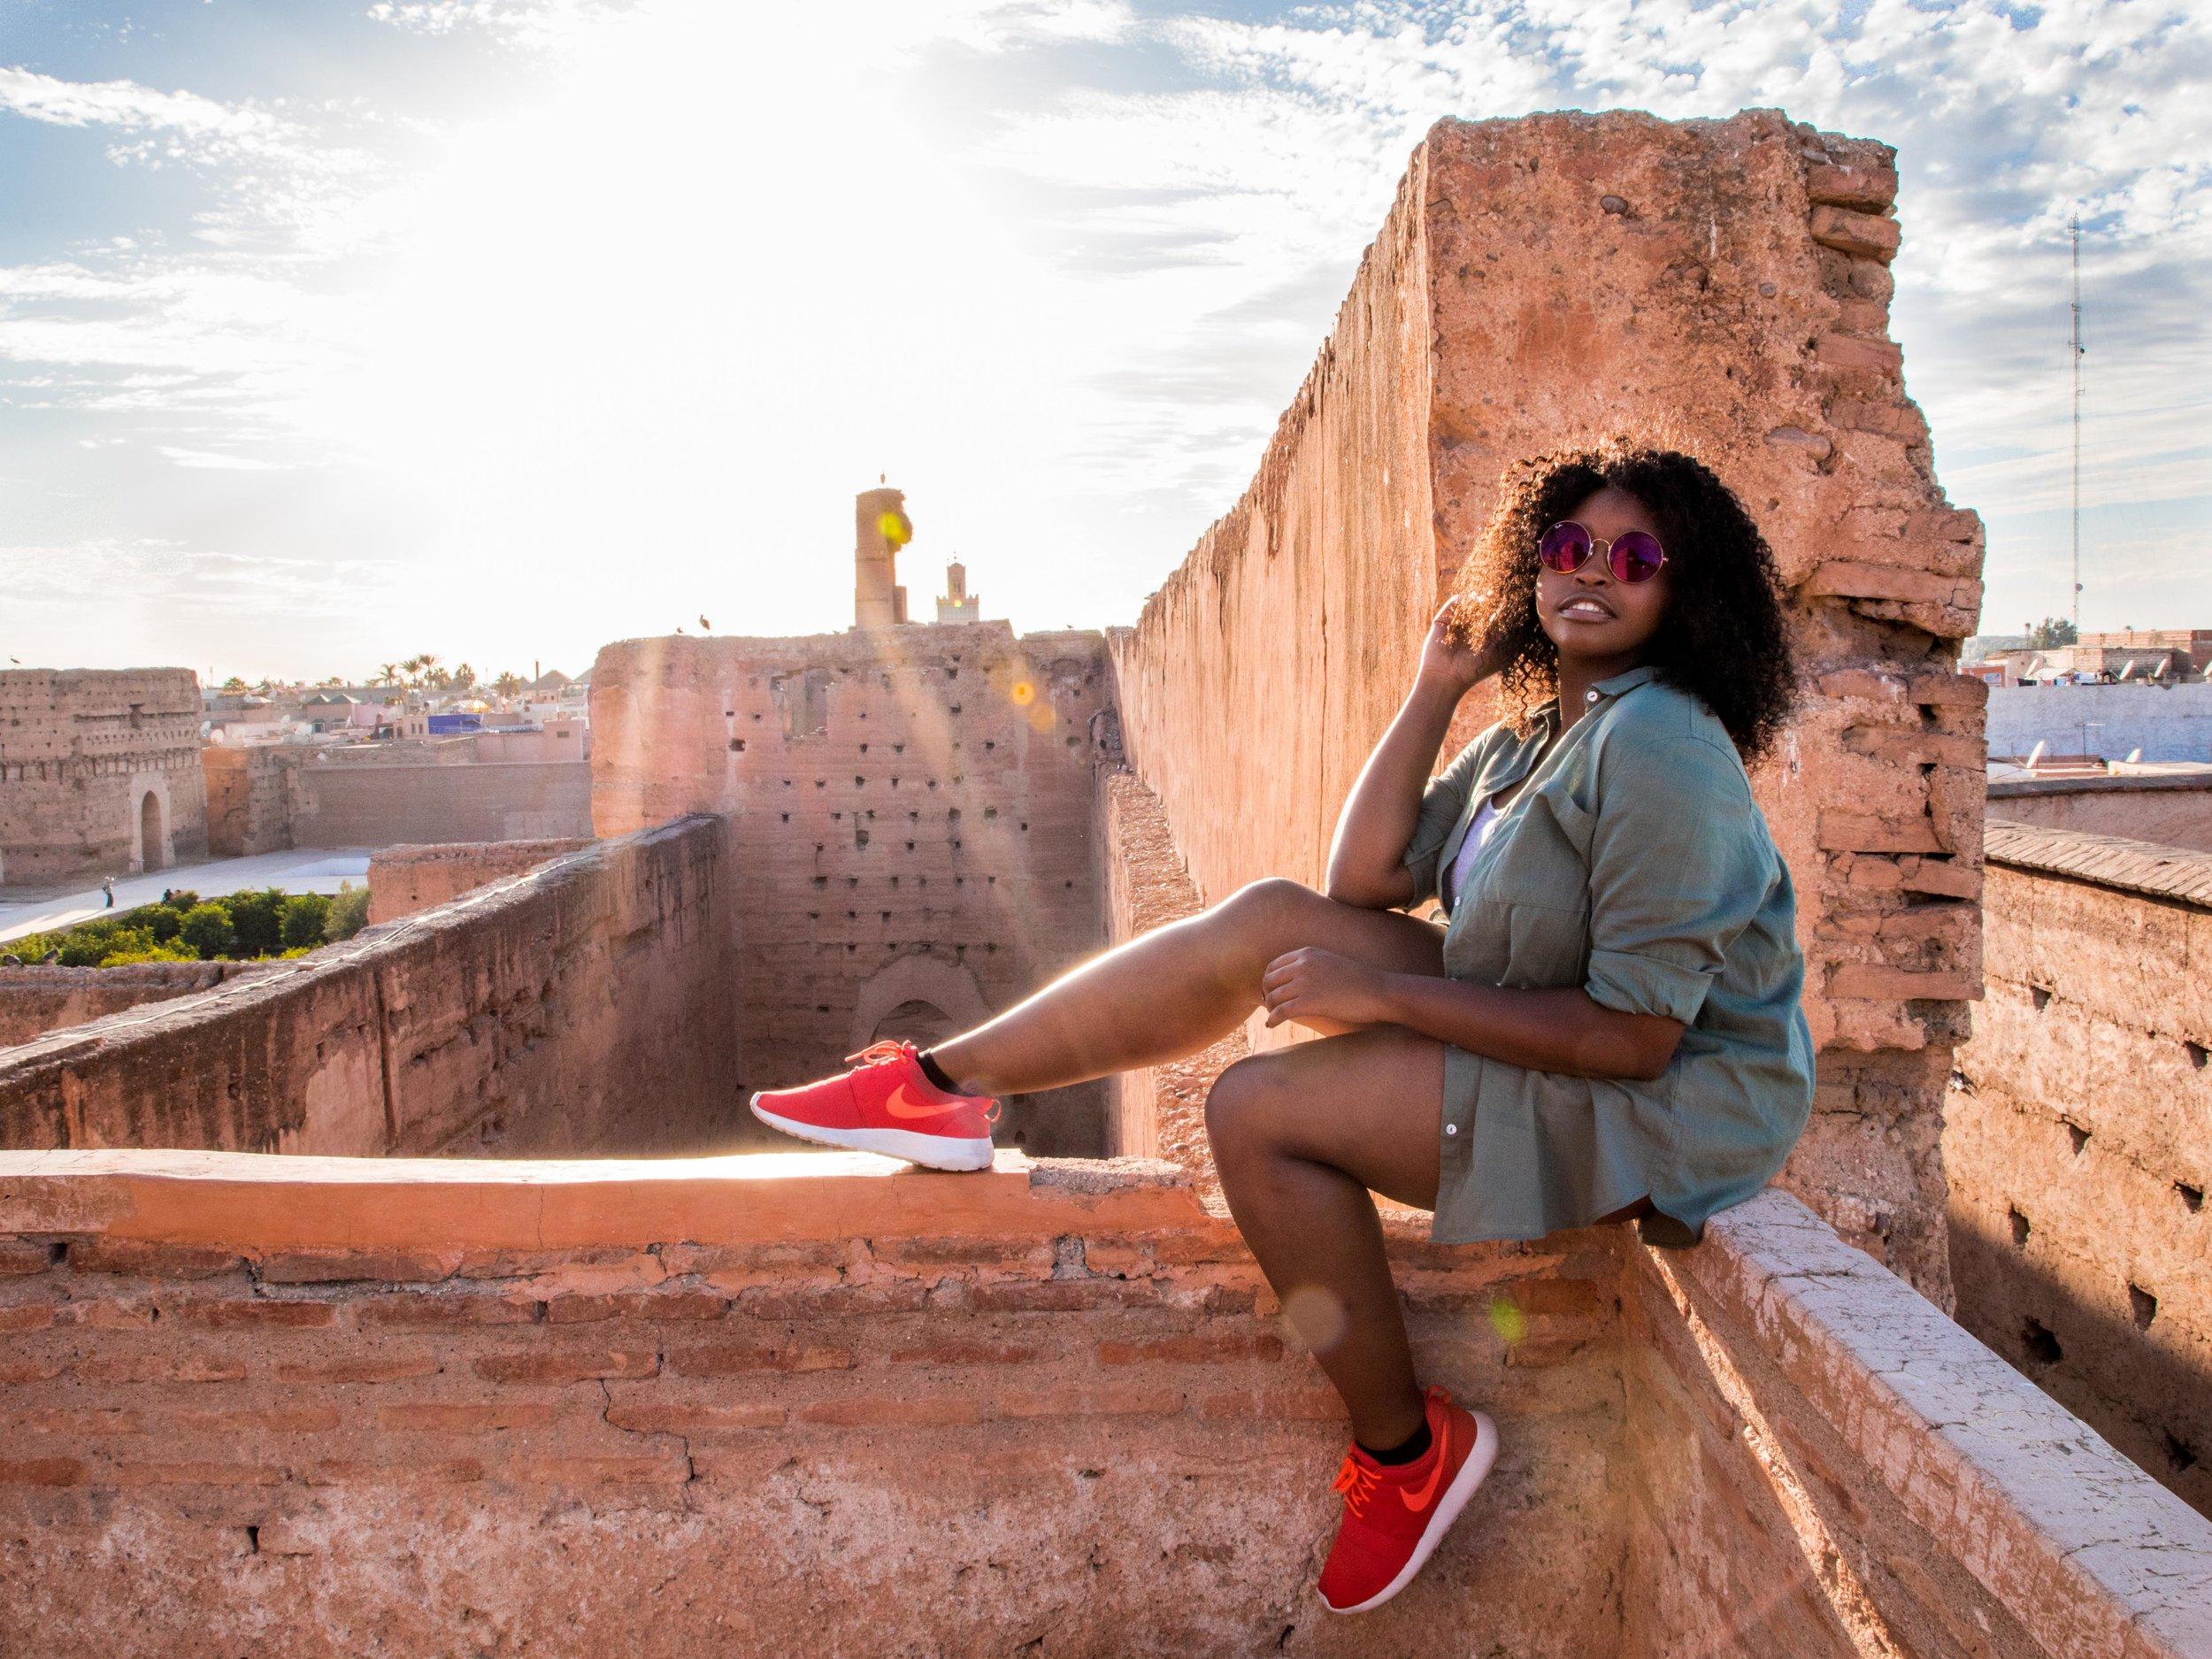 Sibu - @sibumabena  attended #honeysinmarrakech '17